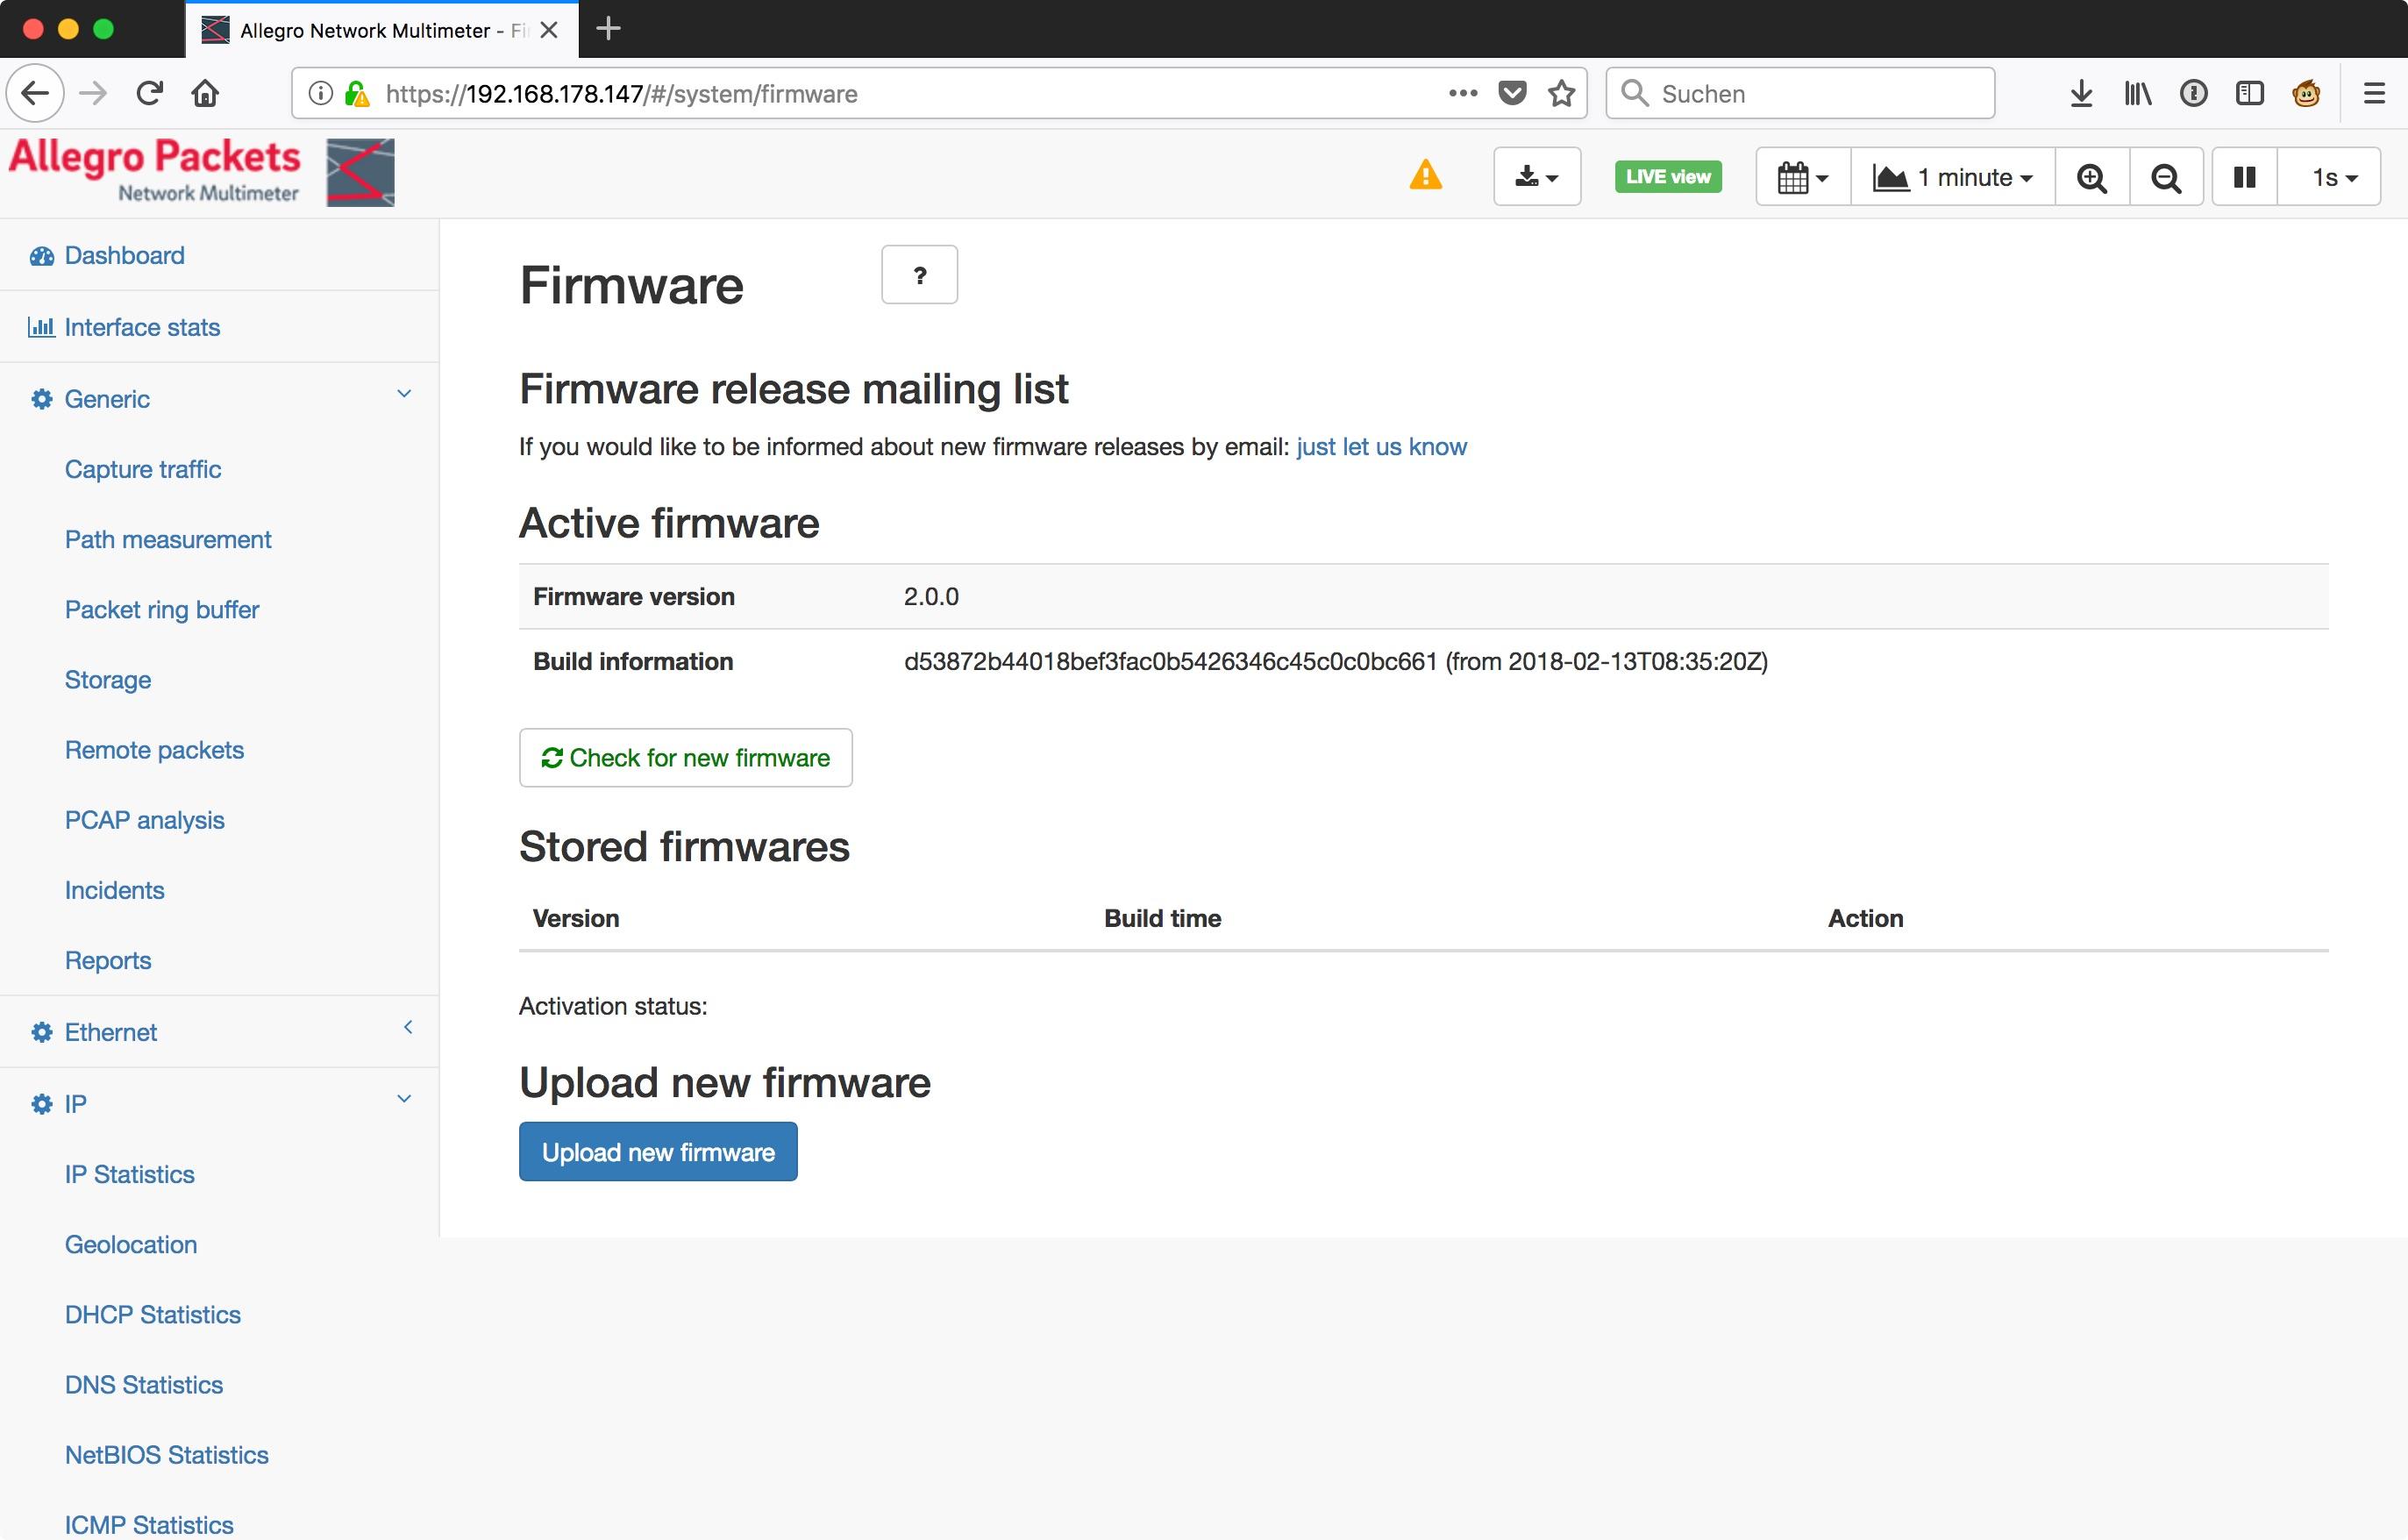 Allegro_Network_Multimeter_-_Firmware